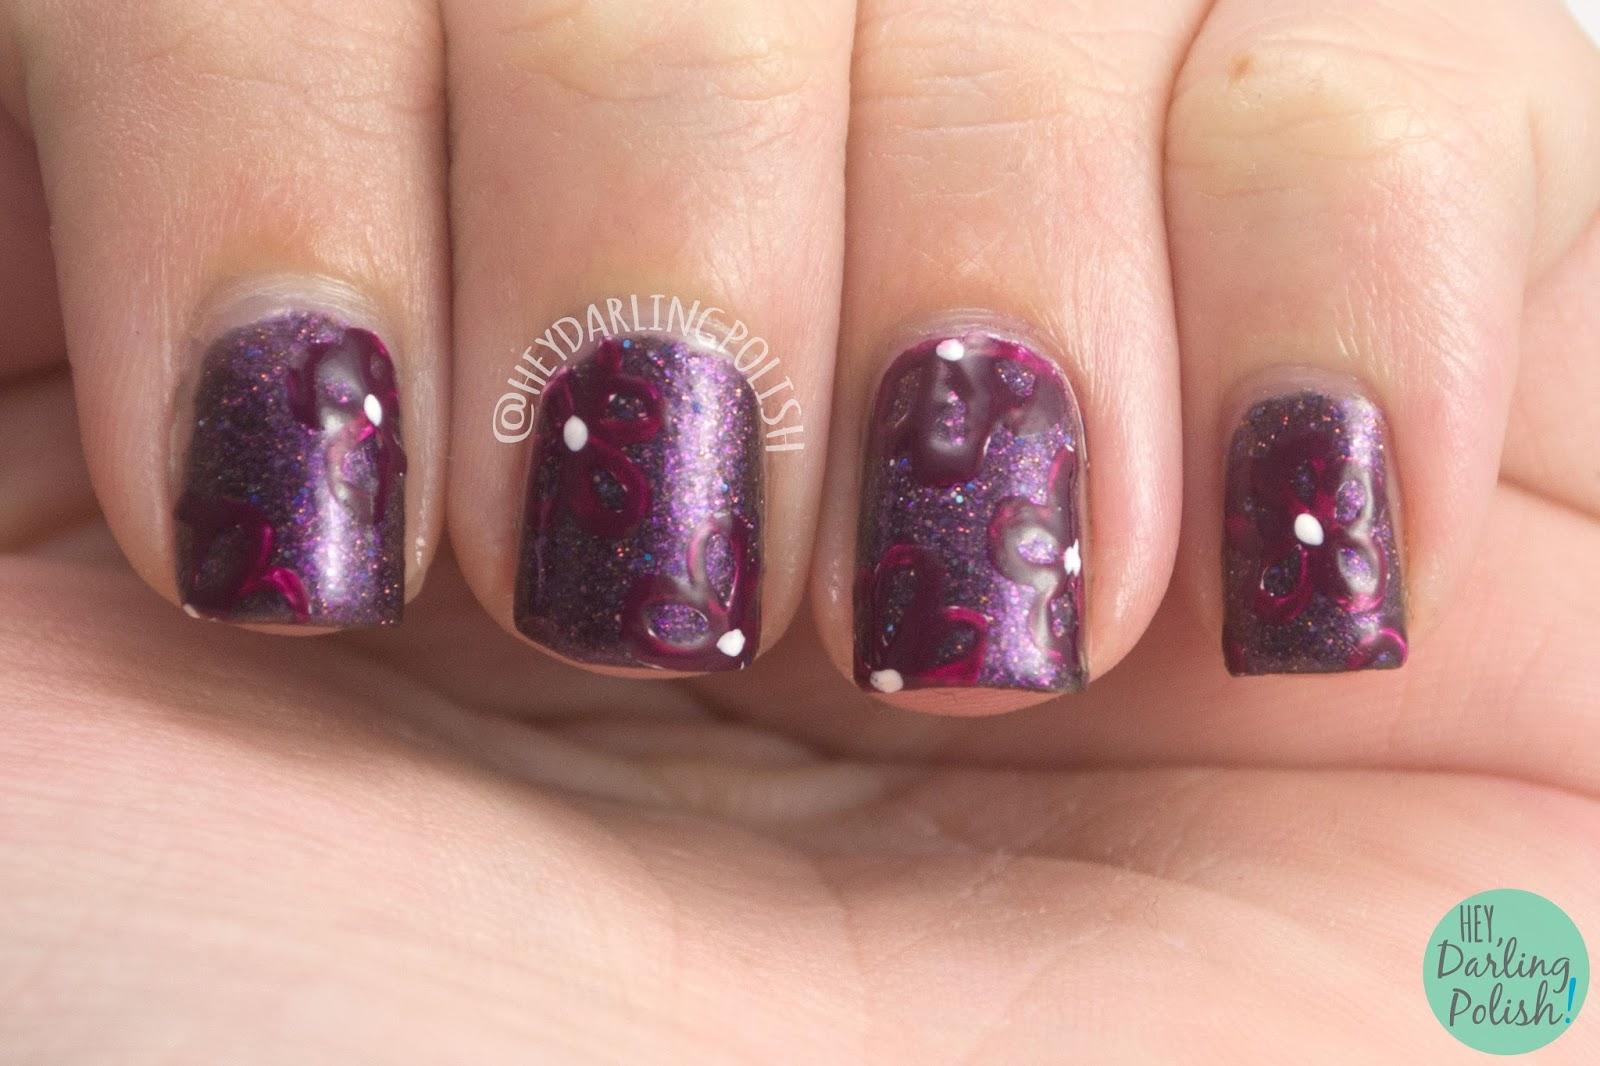 flowers, flor de muerto, nails, nail art, nail polish, hey darling polish, black dahlia lacquer, indie polish